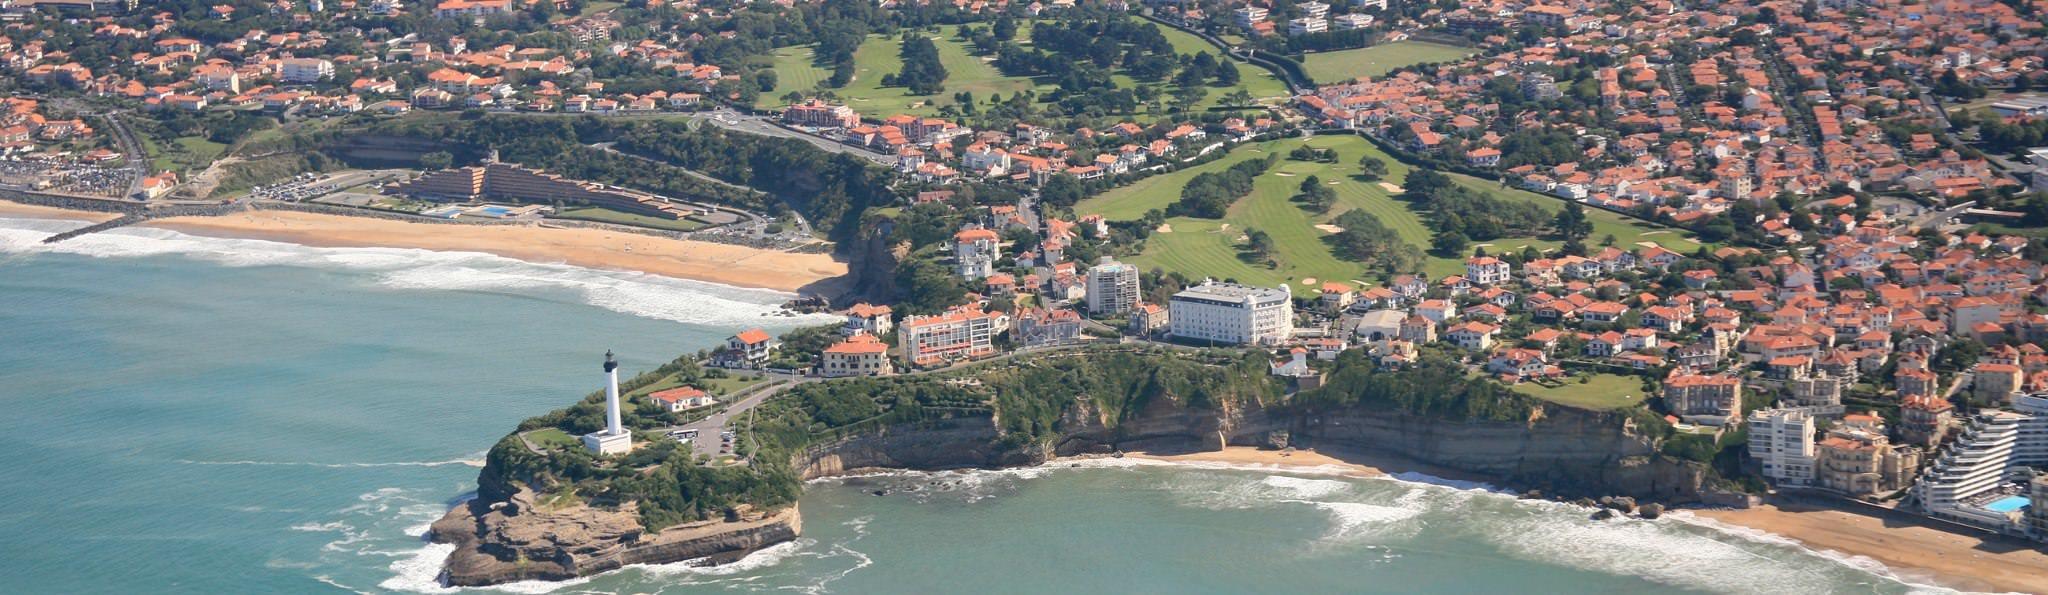 Biarritz Le Phare Golf Club